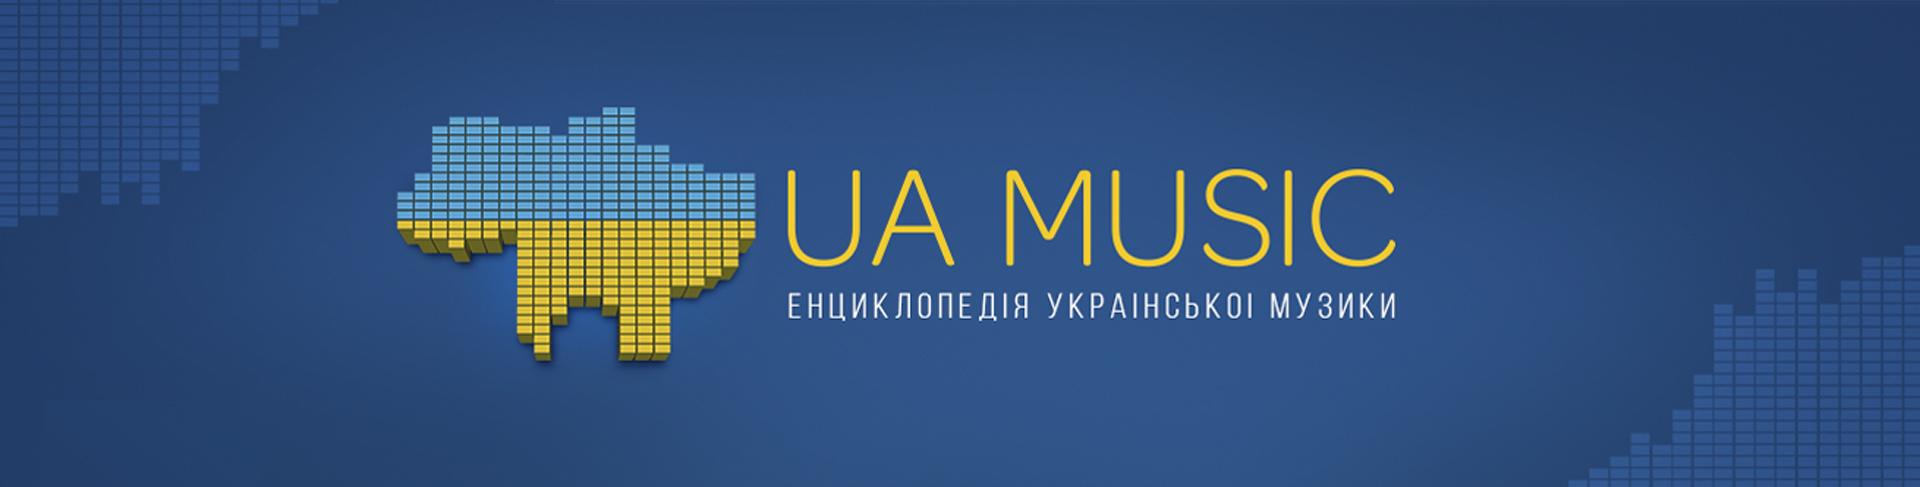 1920 JAZZ PARNAS — UA MUSIC | Енциклопедія української музики